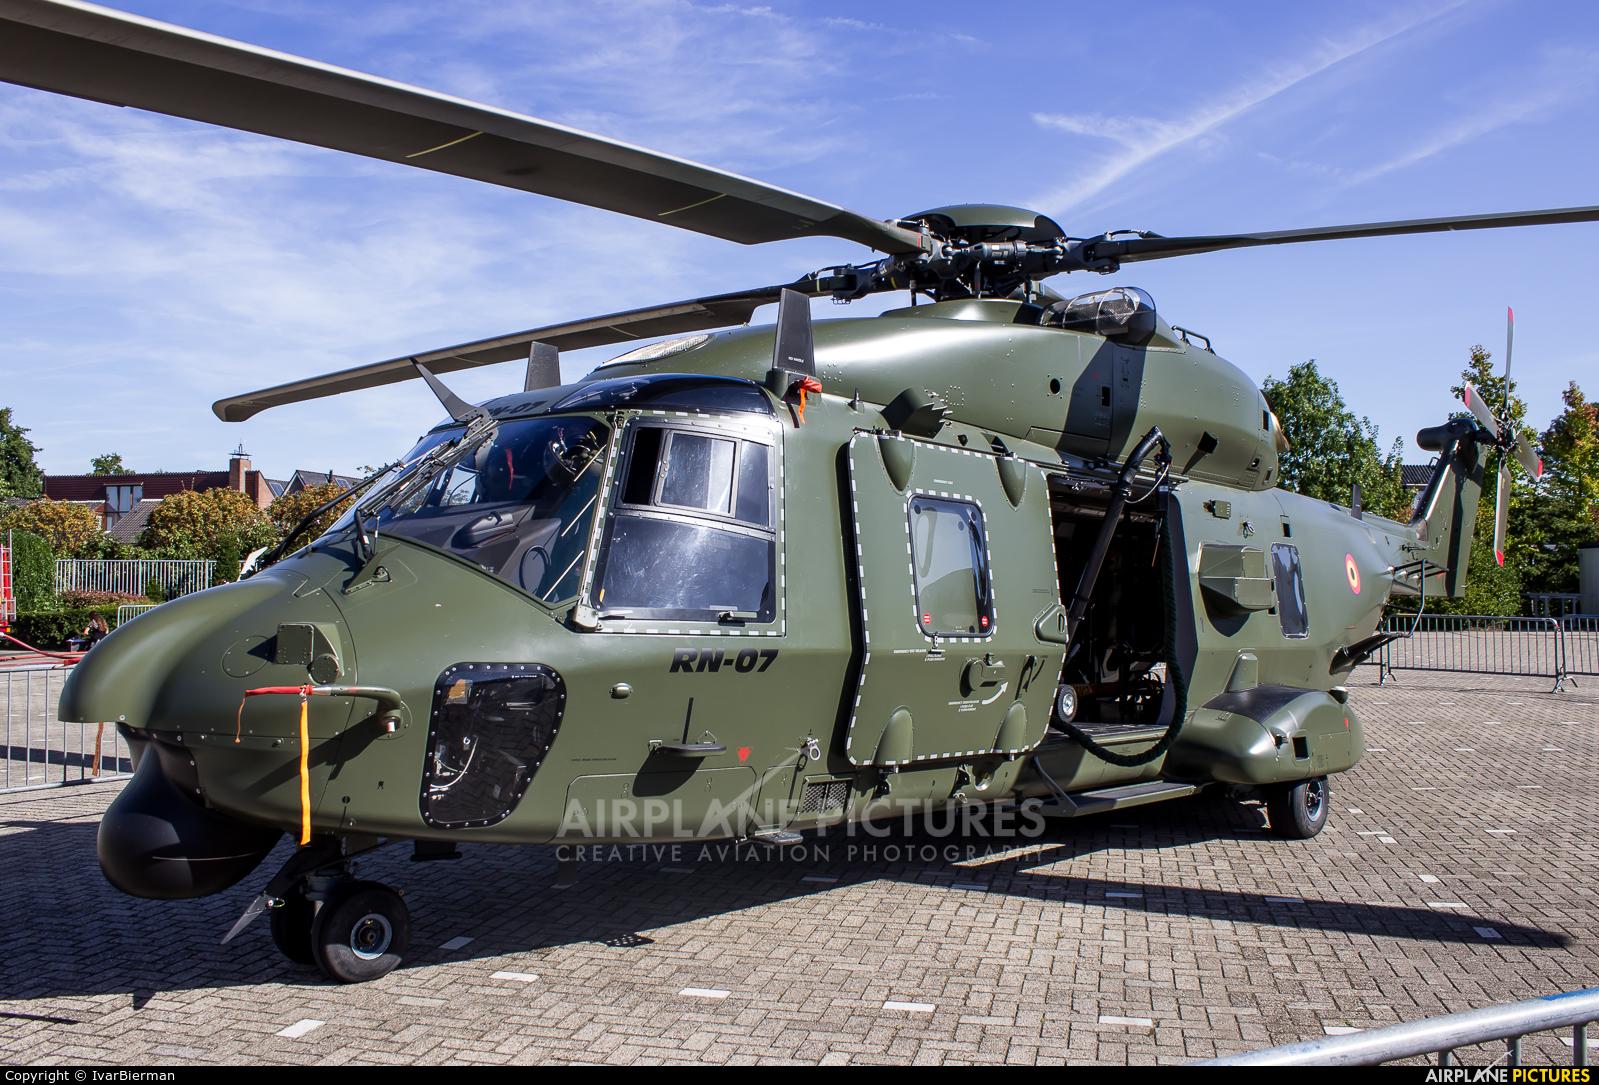 Belgium - Air Force RN-07 aircraft at Off Airport - Netherlands